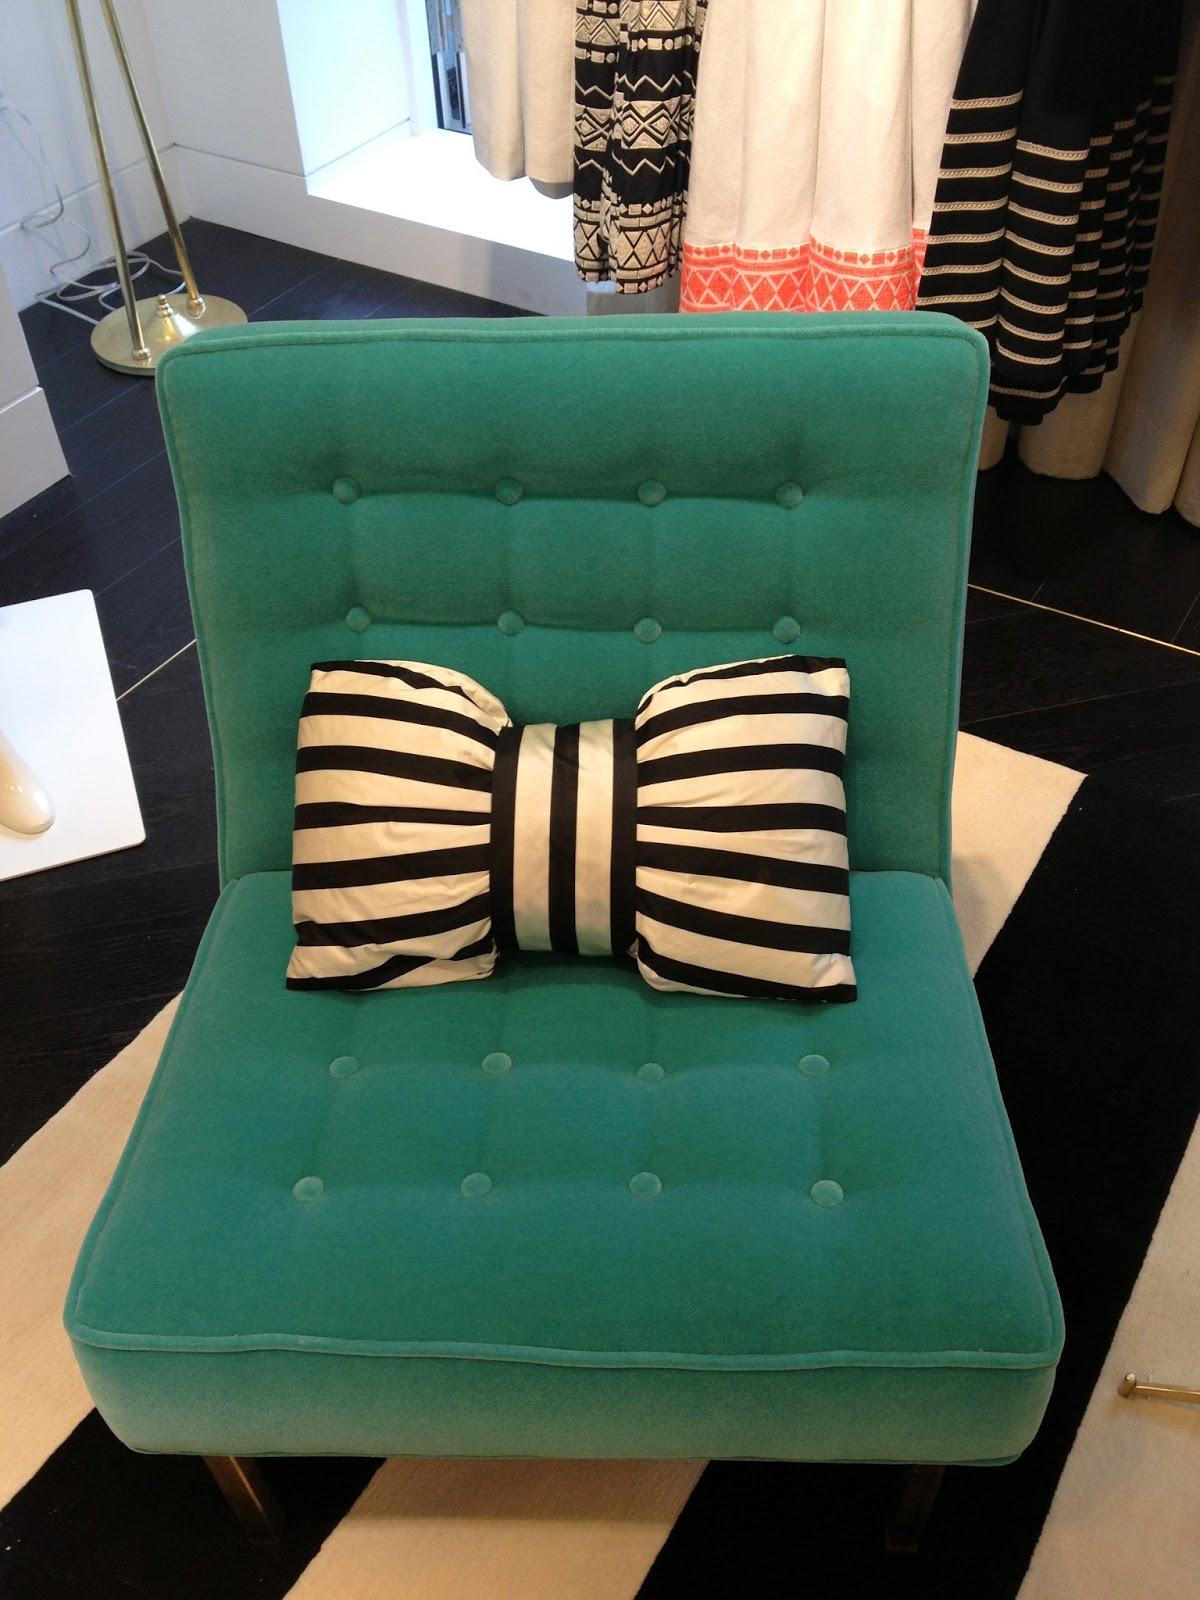 pillow diy pillows watkins projects polka gold dot throw gallery blanket living cushion kate casa spade inspired new